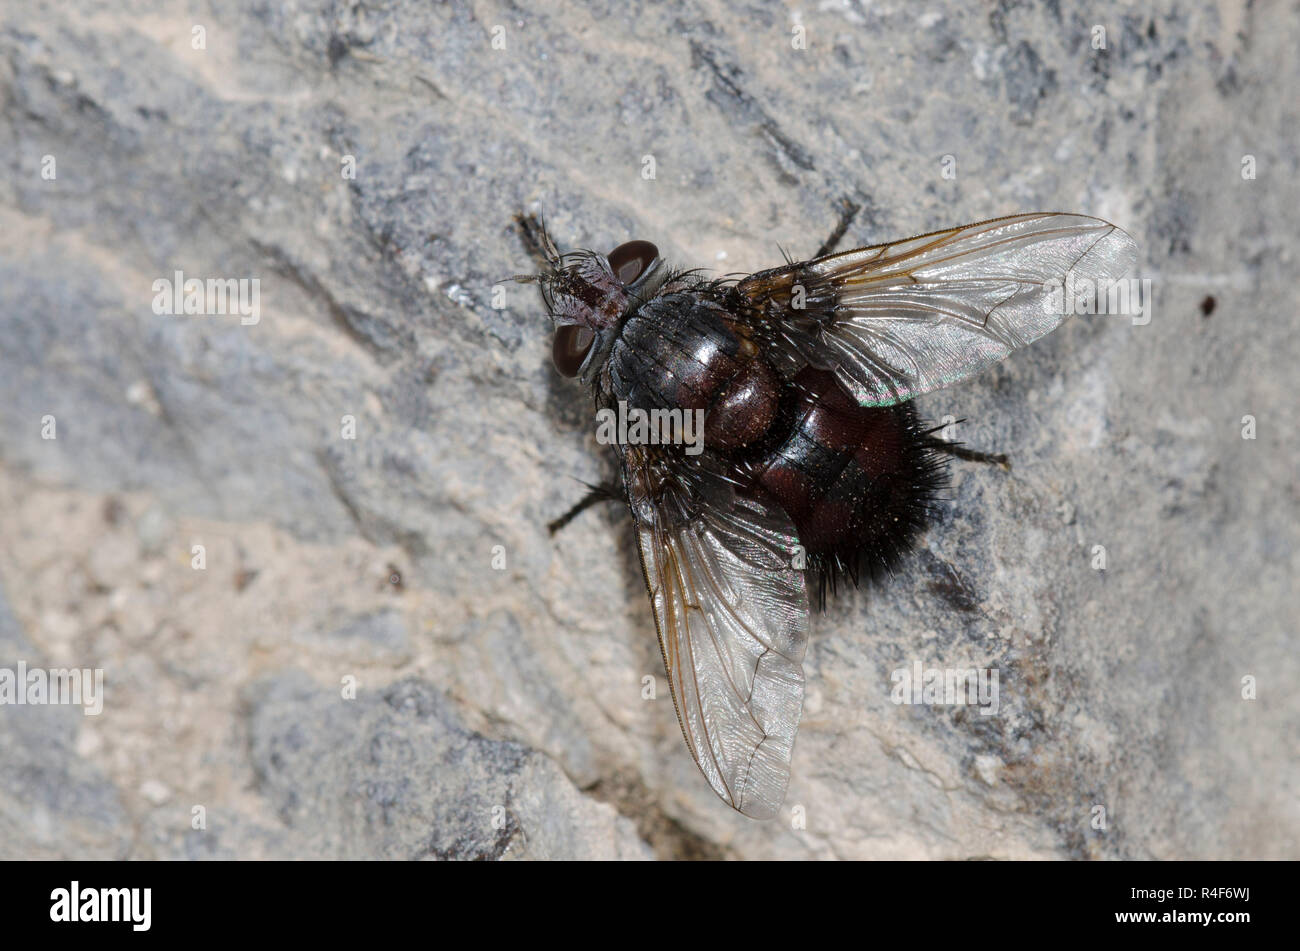 Tachinid Fly, Leschenaultia sp. Stock Photo